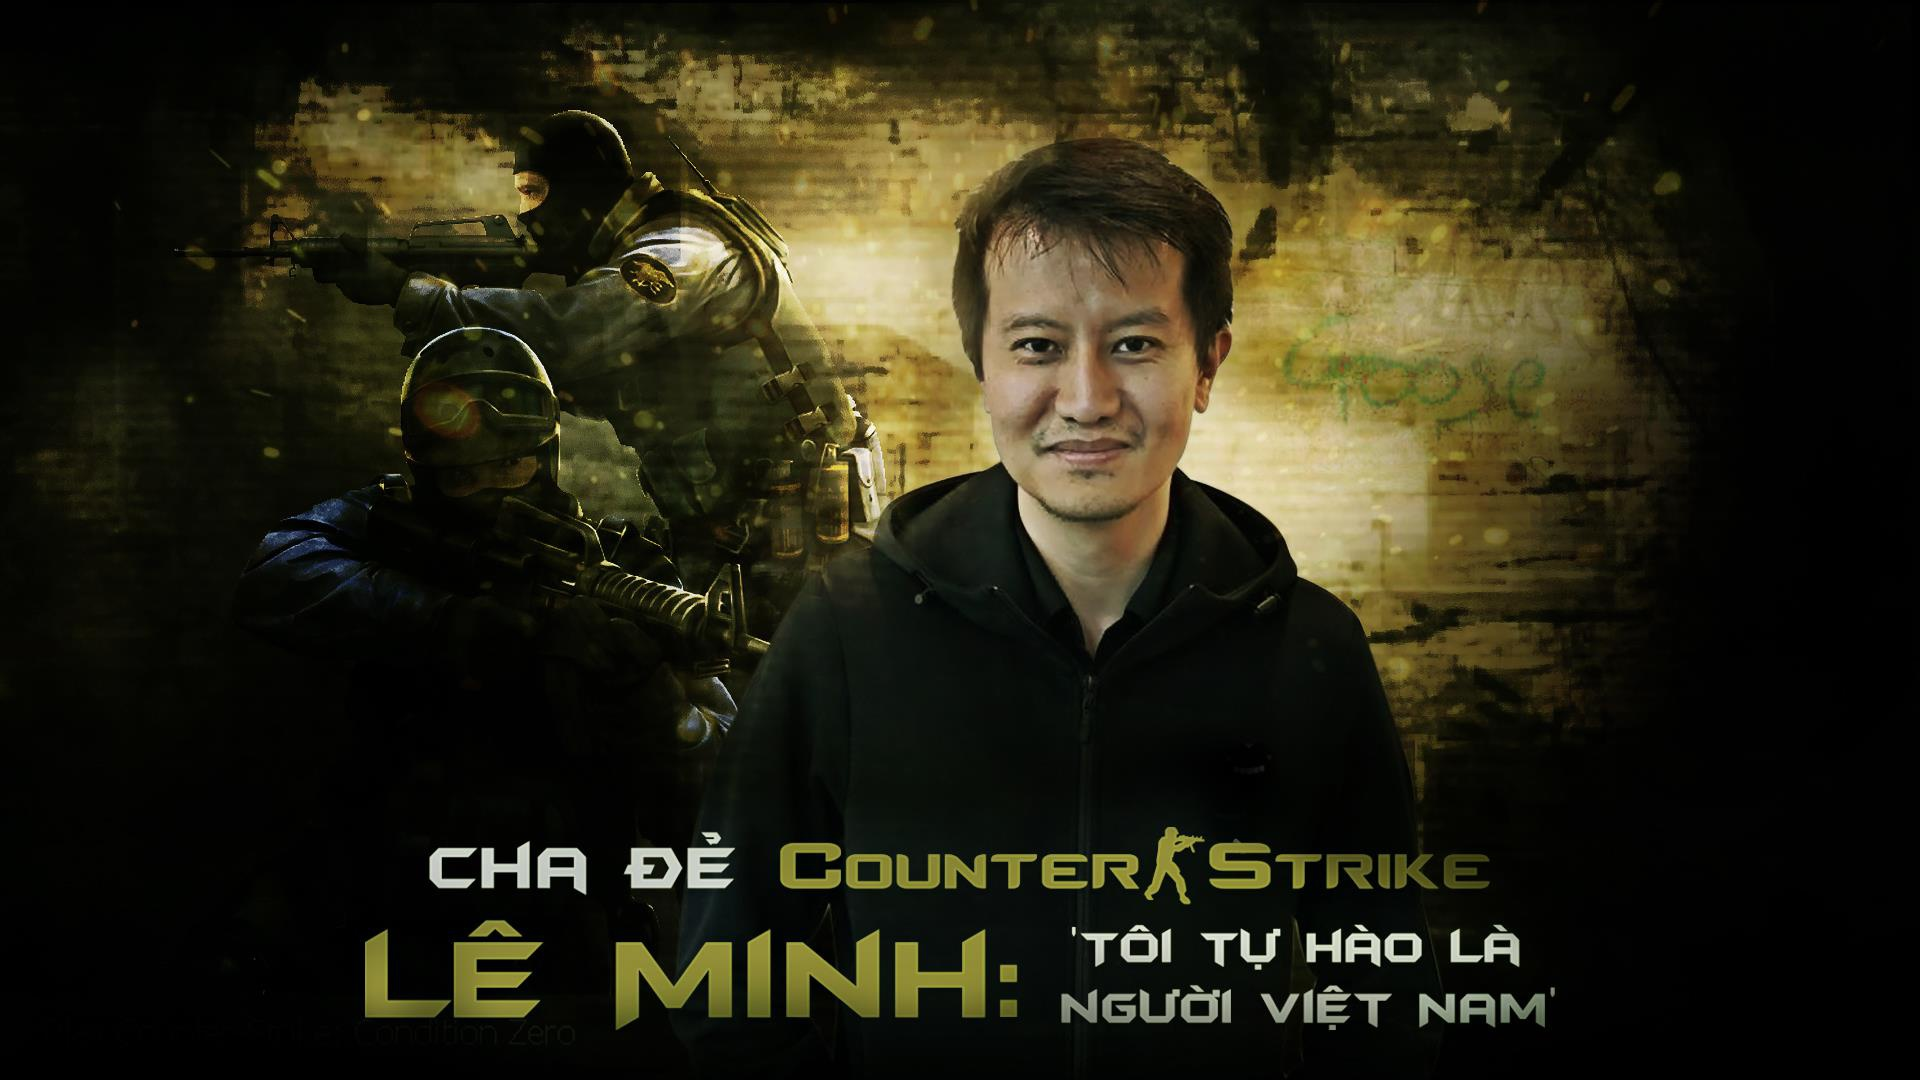 Cha de Counter-Strike Le Minh tu hao la nguoi Viet anh 2